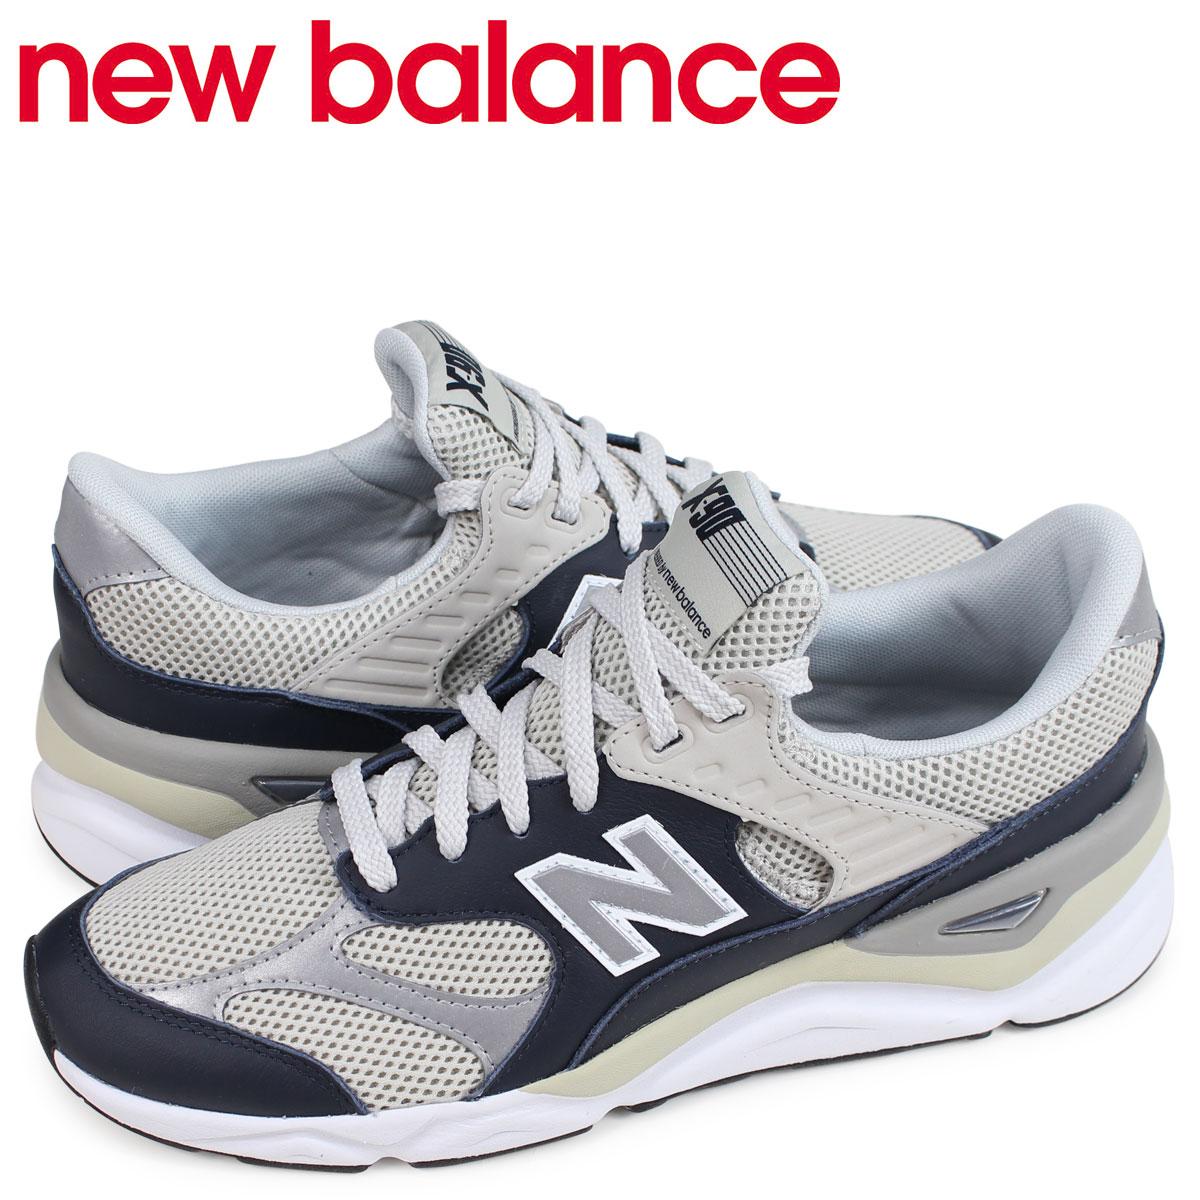 msx90 new balance